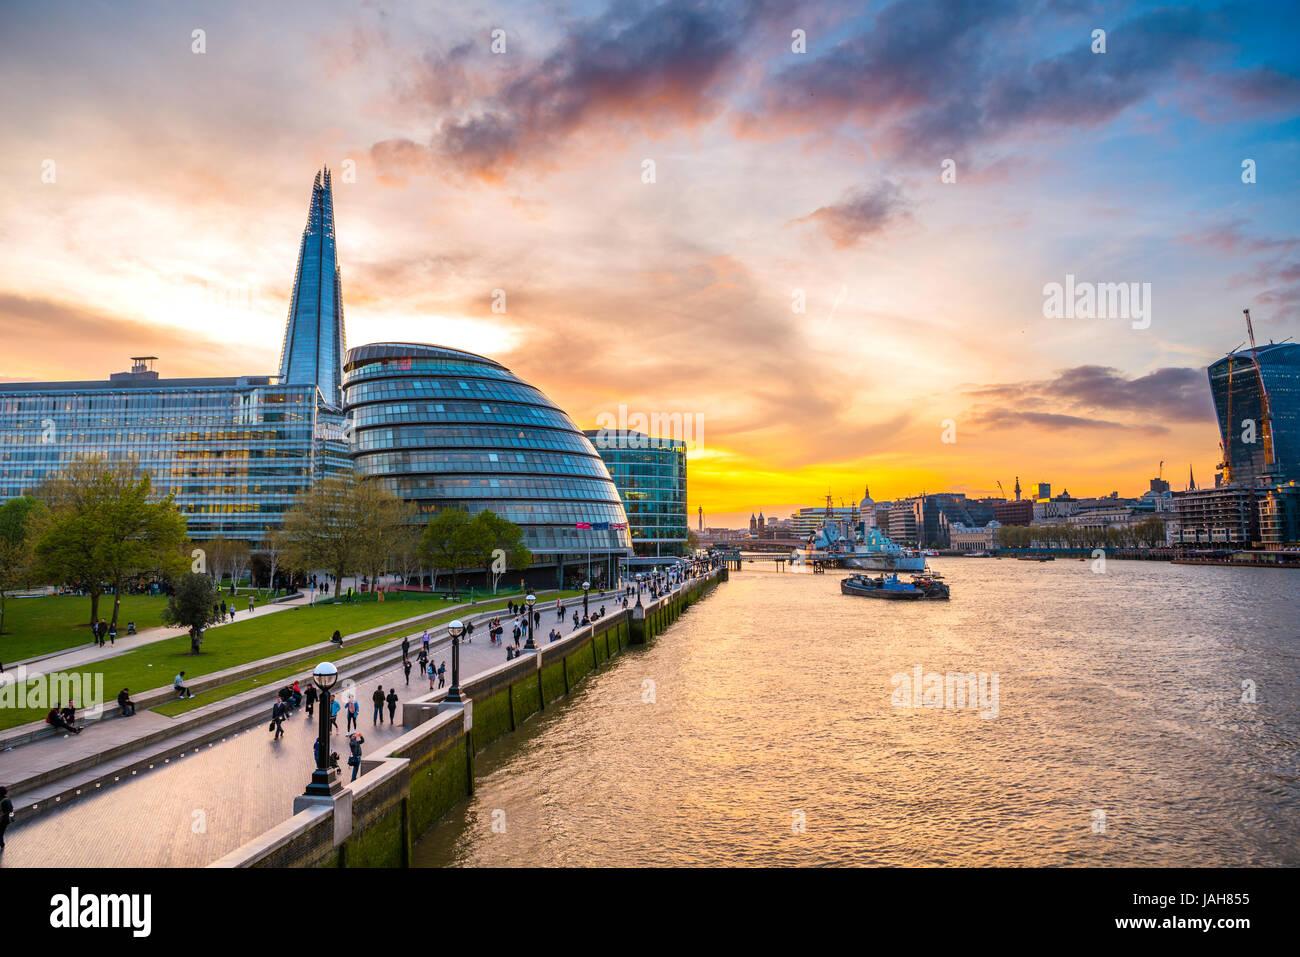 Riverside promenade on the Thames, Potters Fields Park, Skyline, London City Hall, The Shard, at sunset, Southwark, - Stock Image